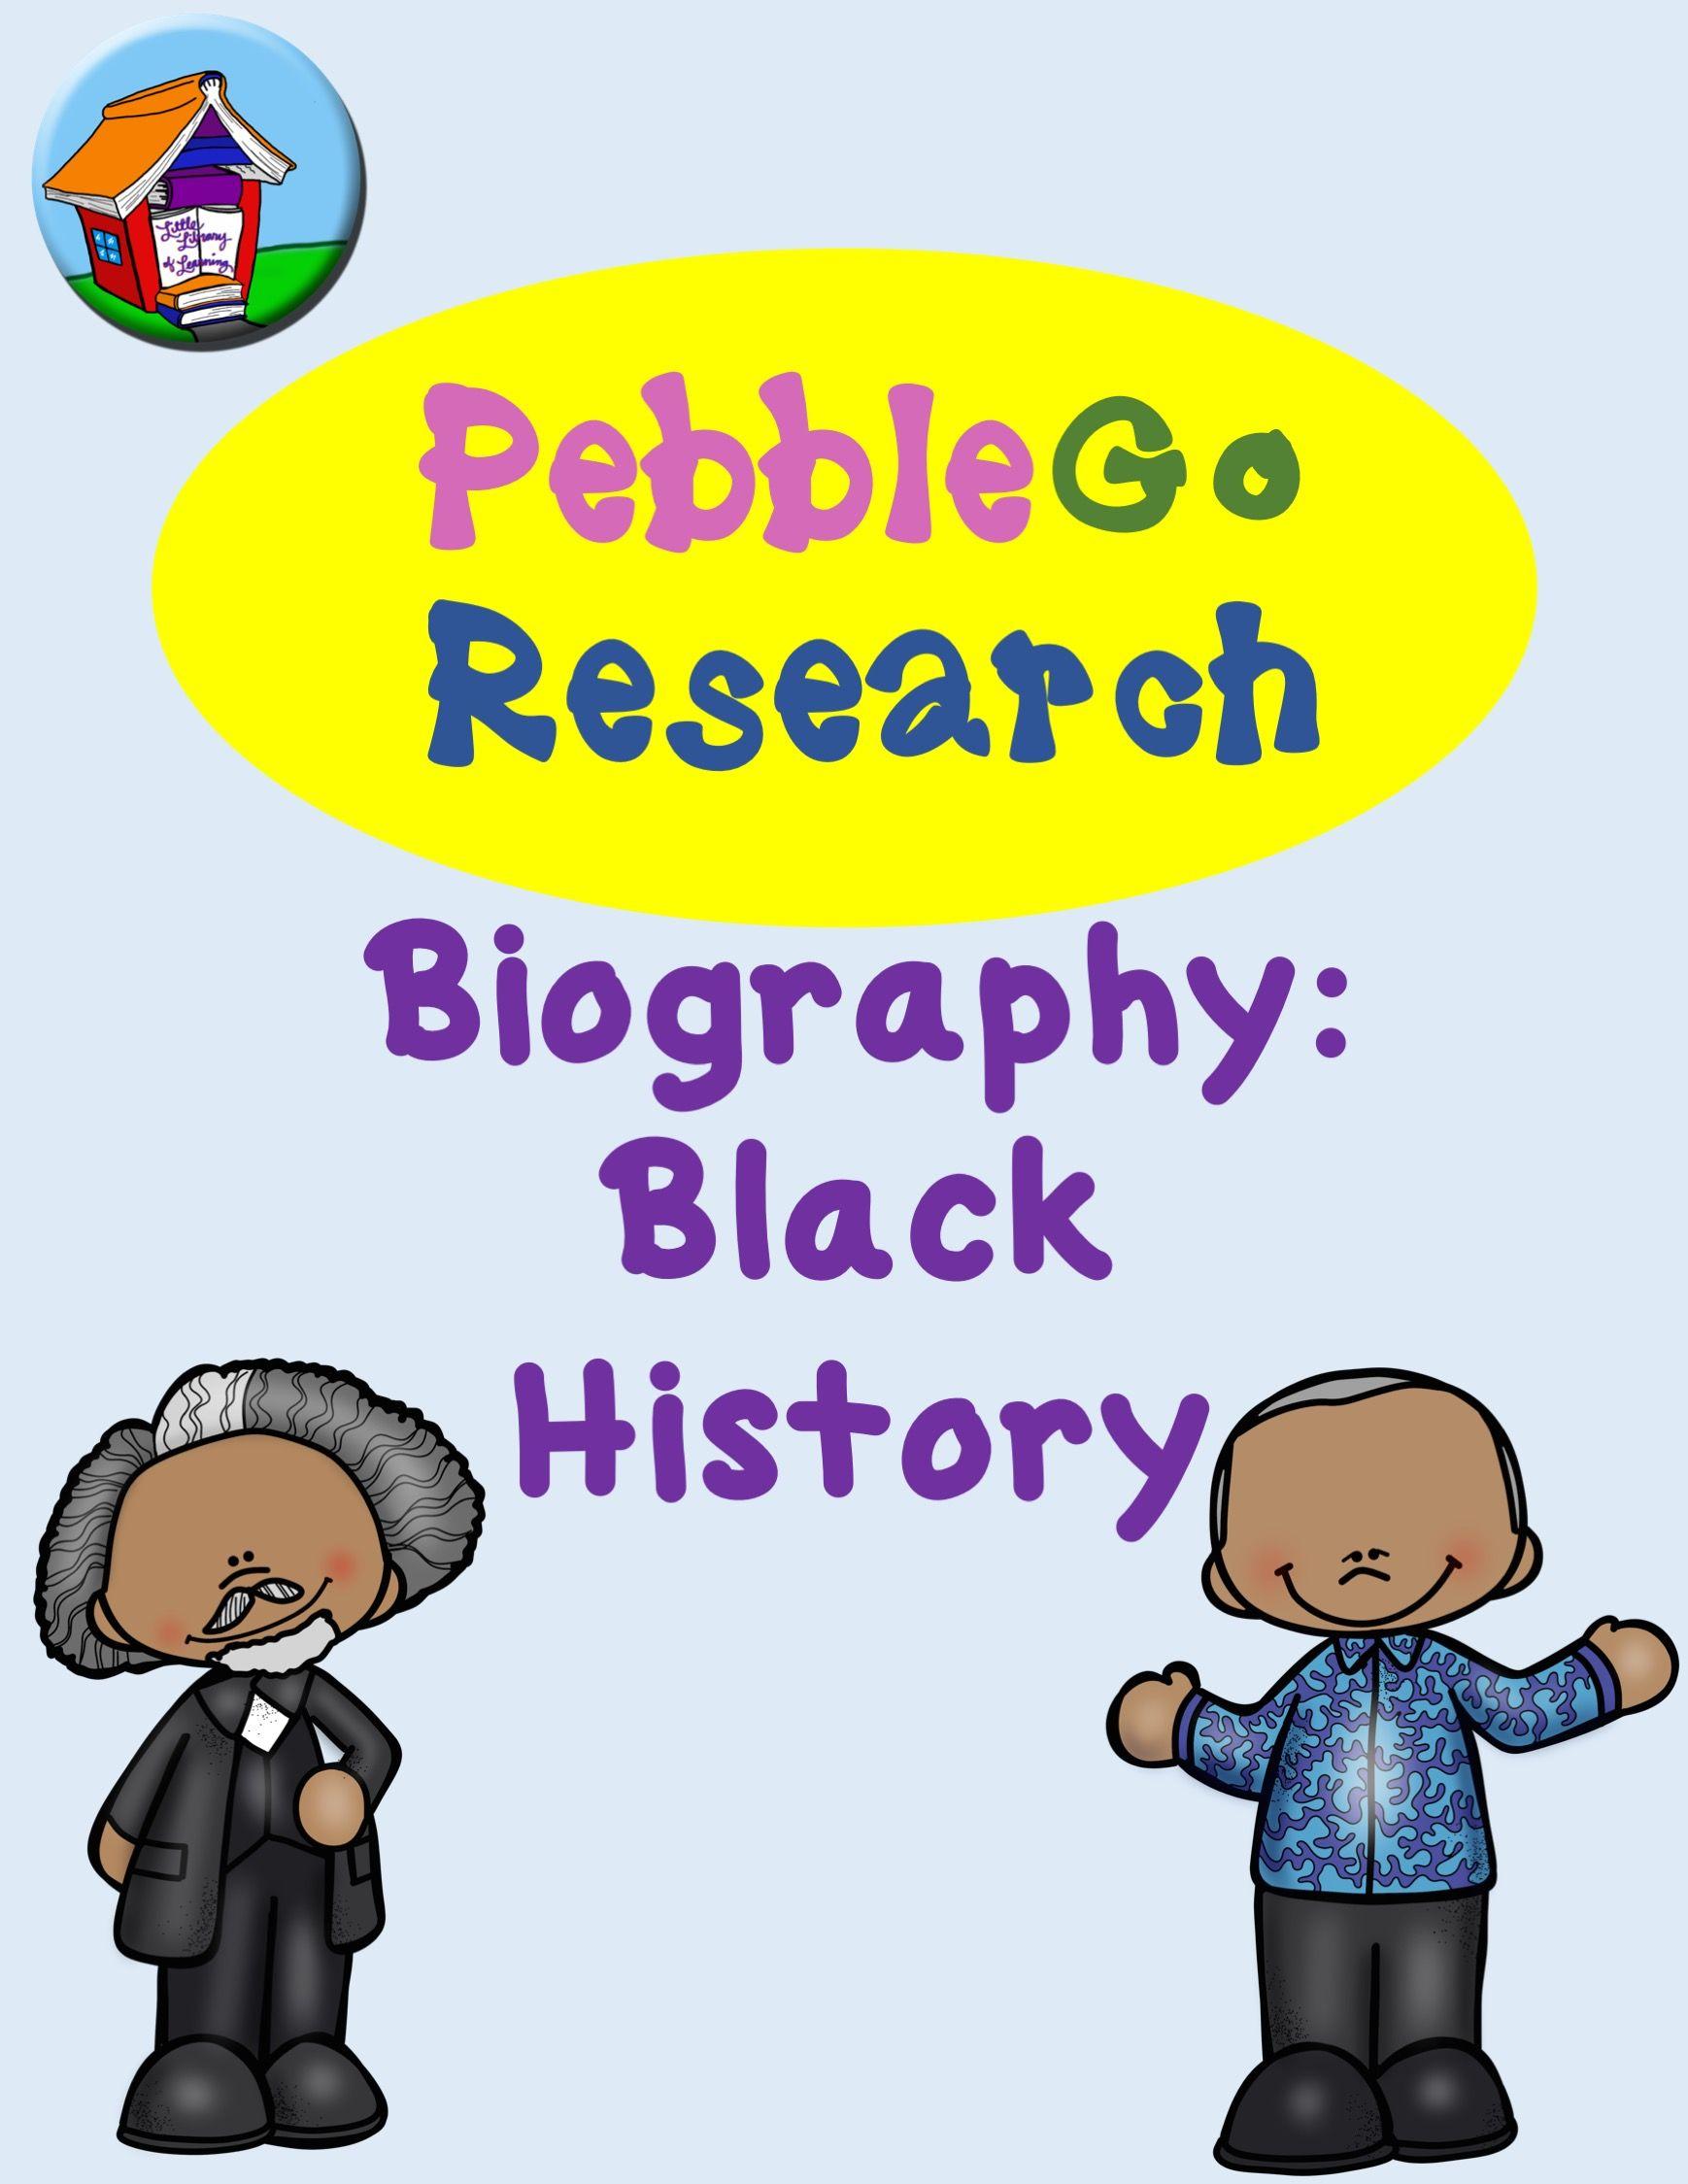 Pebblego Biography Black History Research